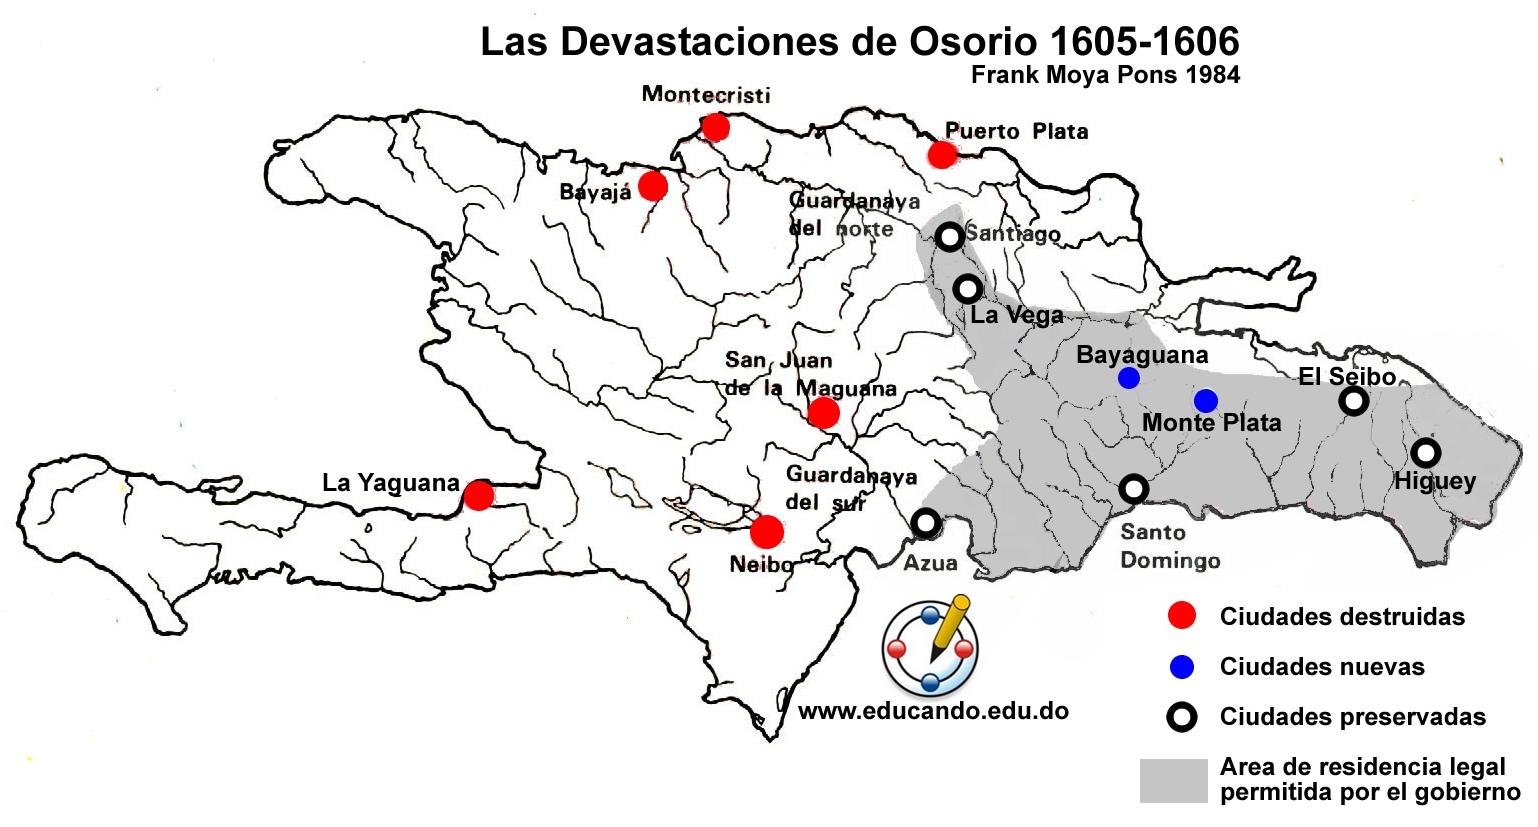 14_devastacionesdeOsorio1605_1606_educando.jpg